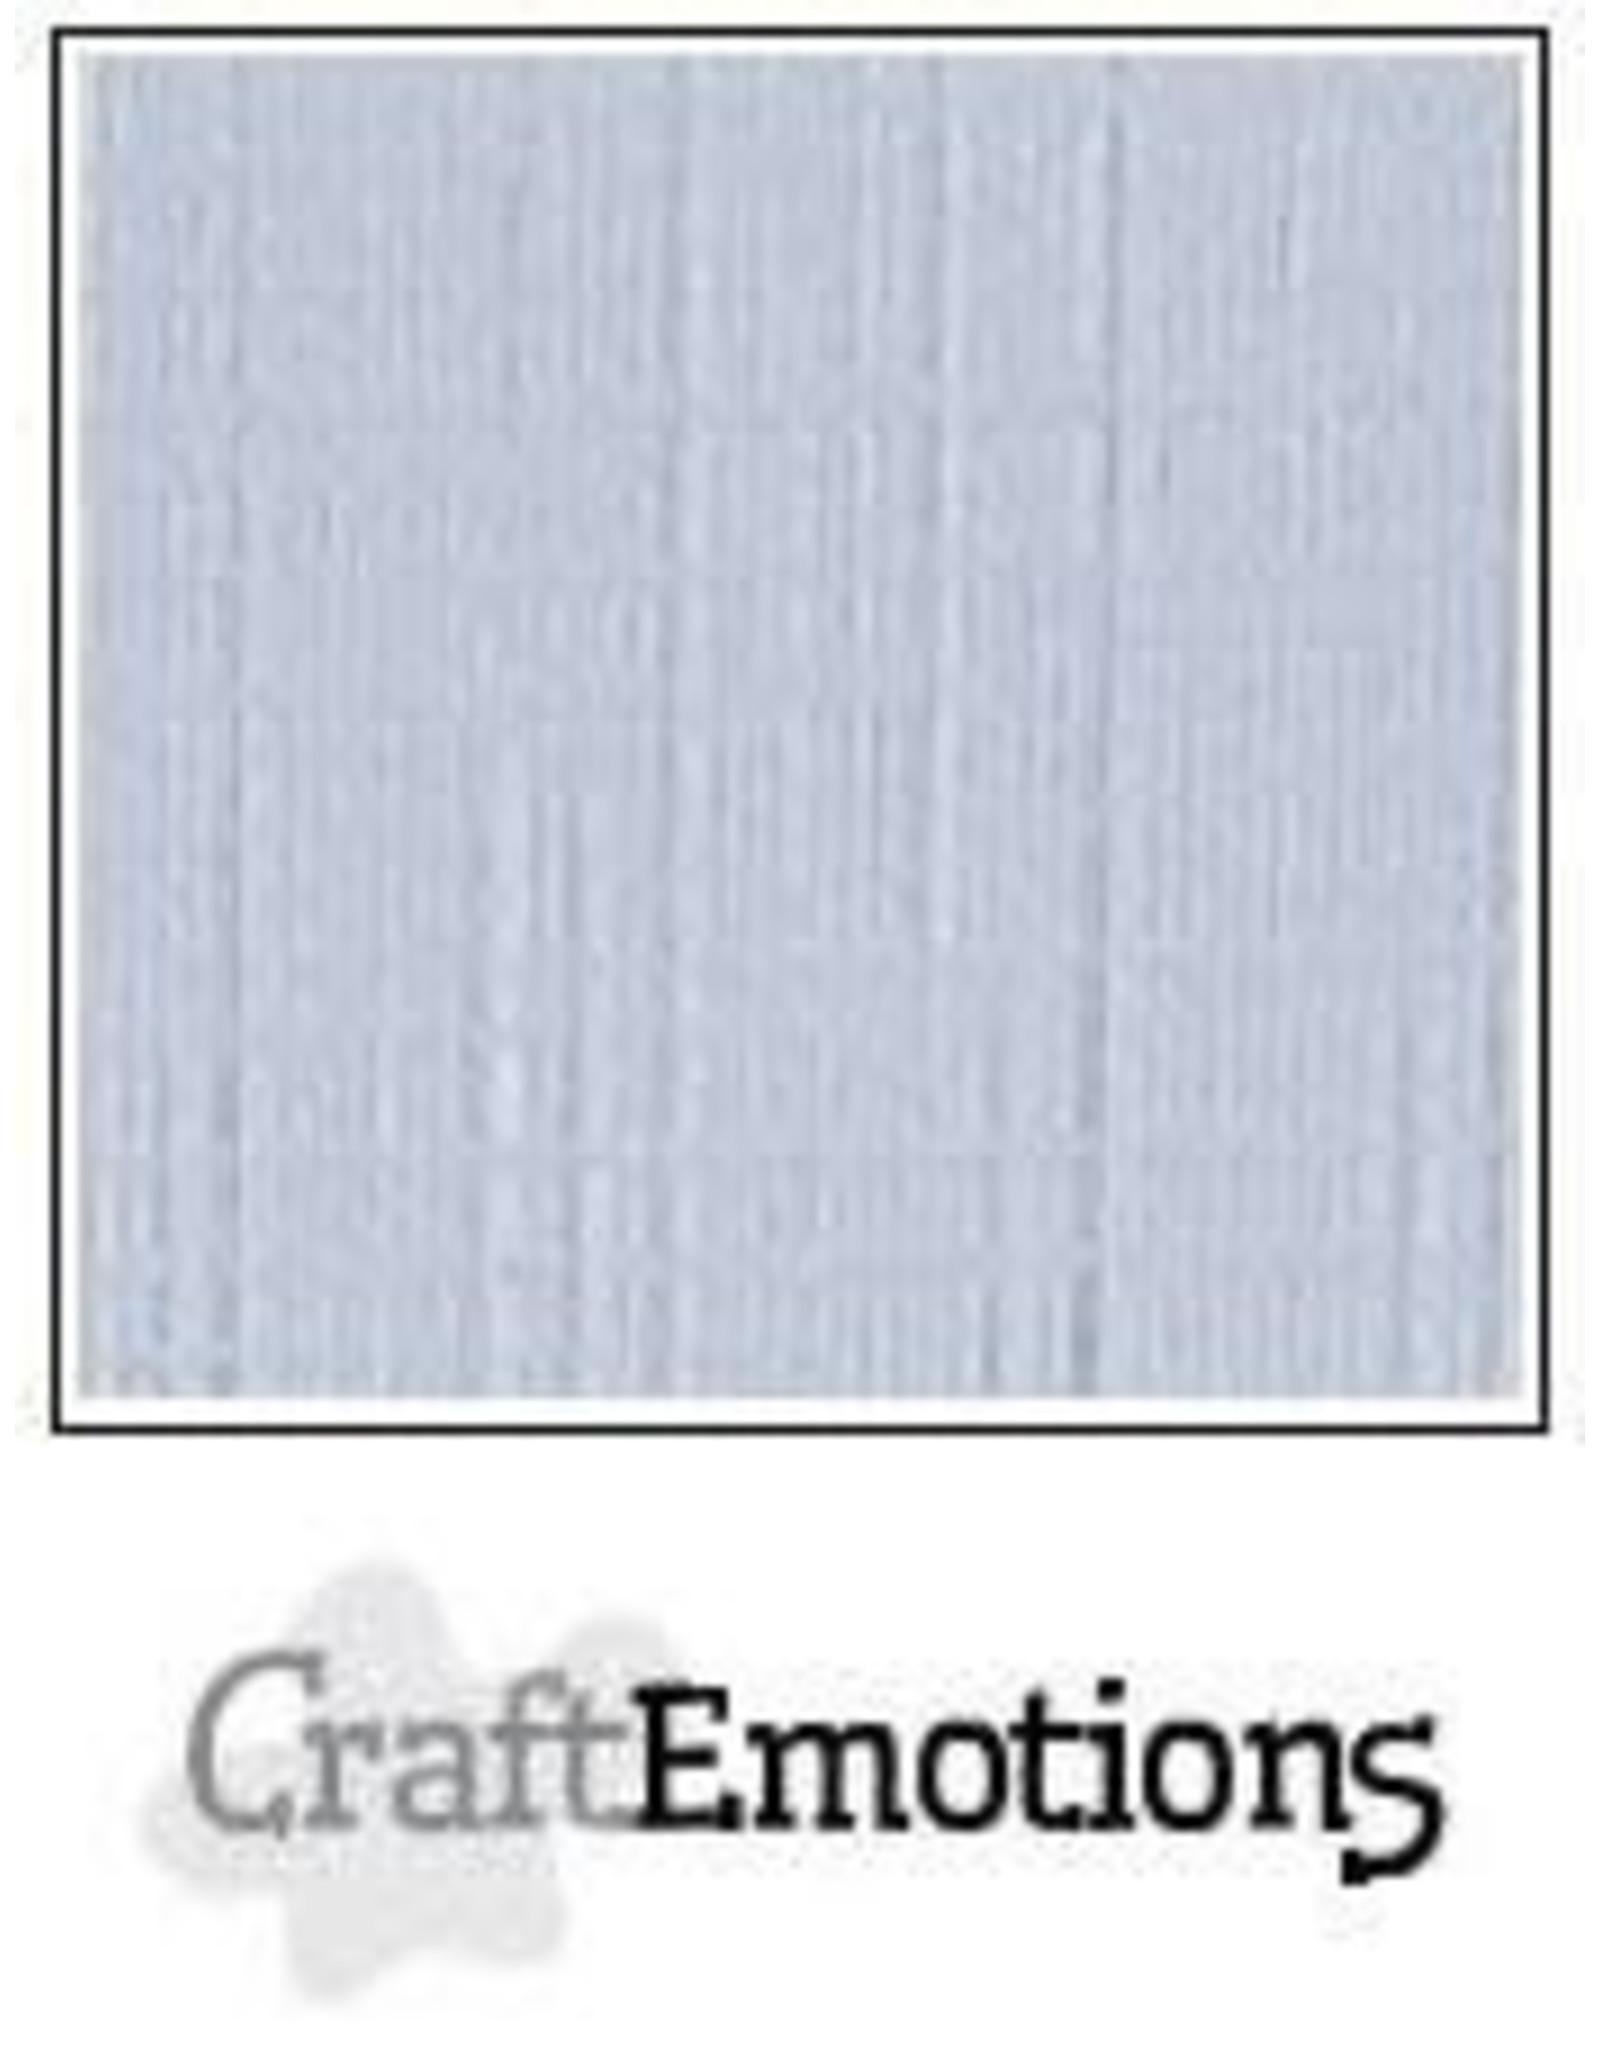 Craft Emotions CraftEmotions linnenkarton  wit 30,0x30,0cm